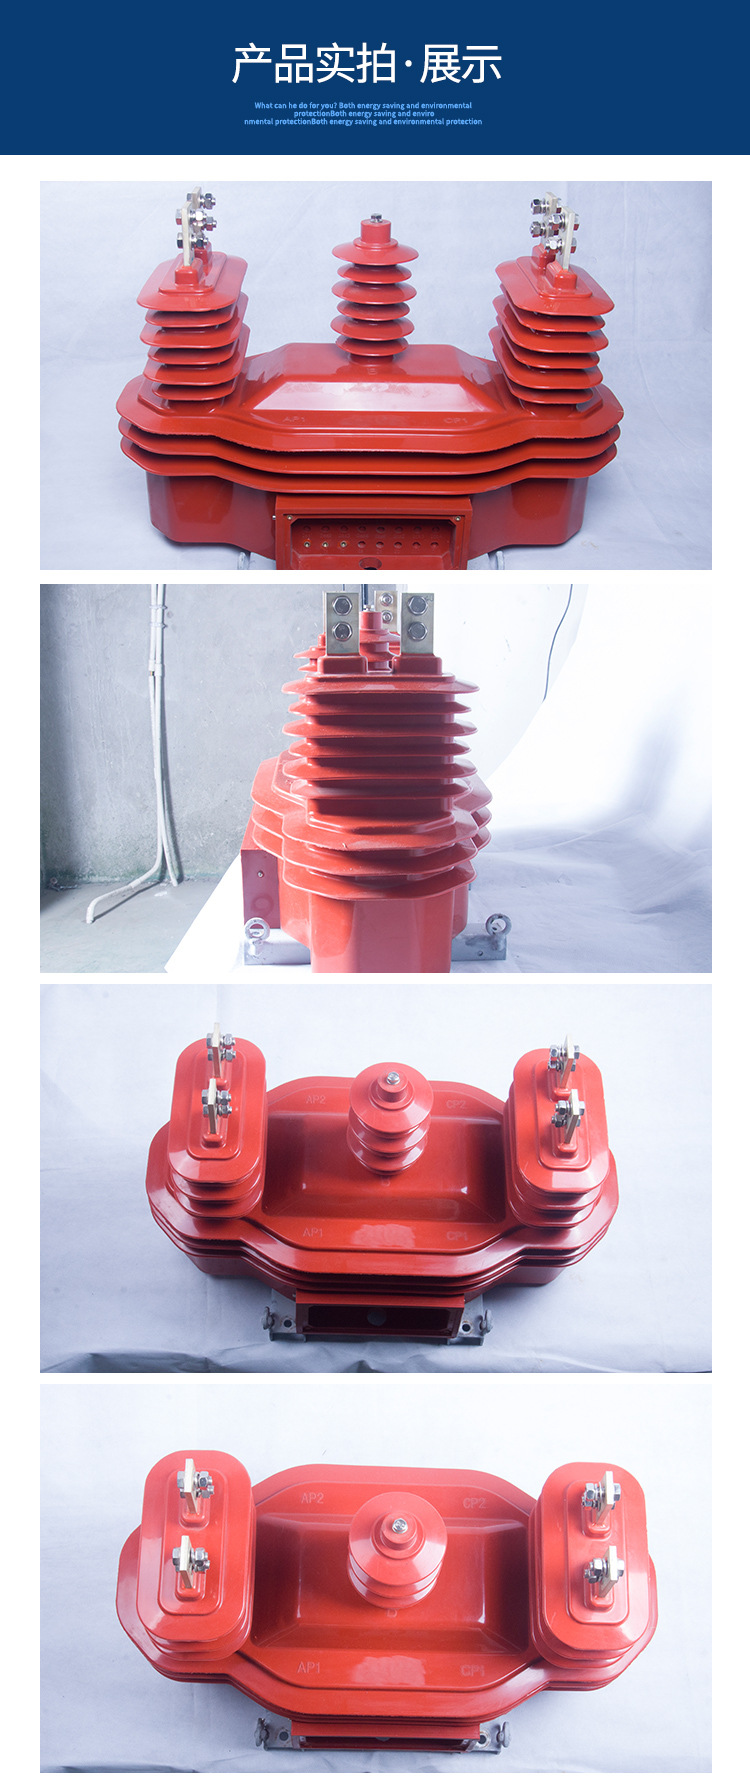 JLSZV-10KV户外高压电力计量箱示例图5